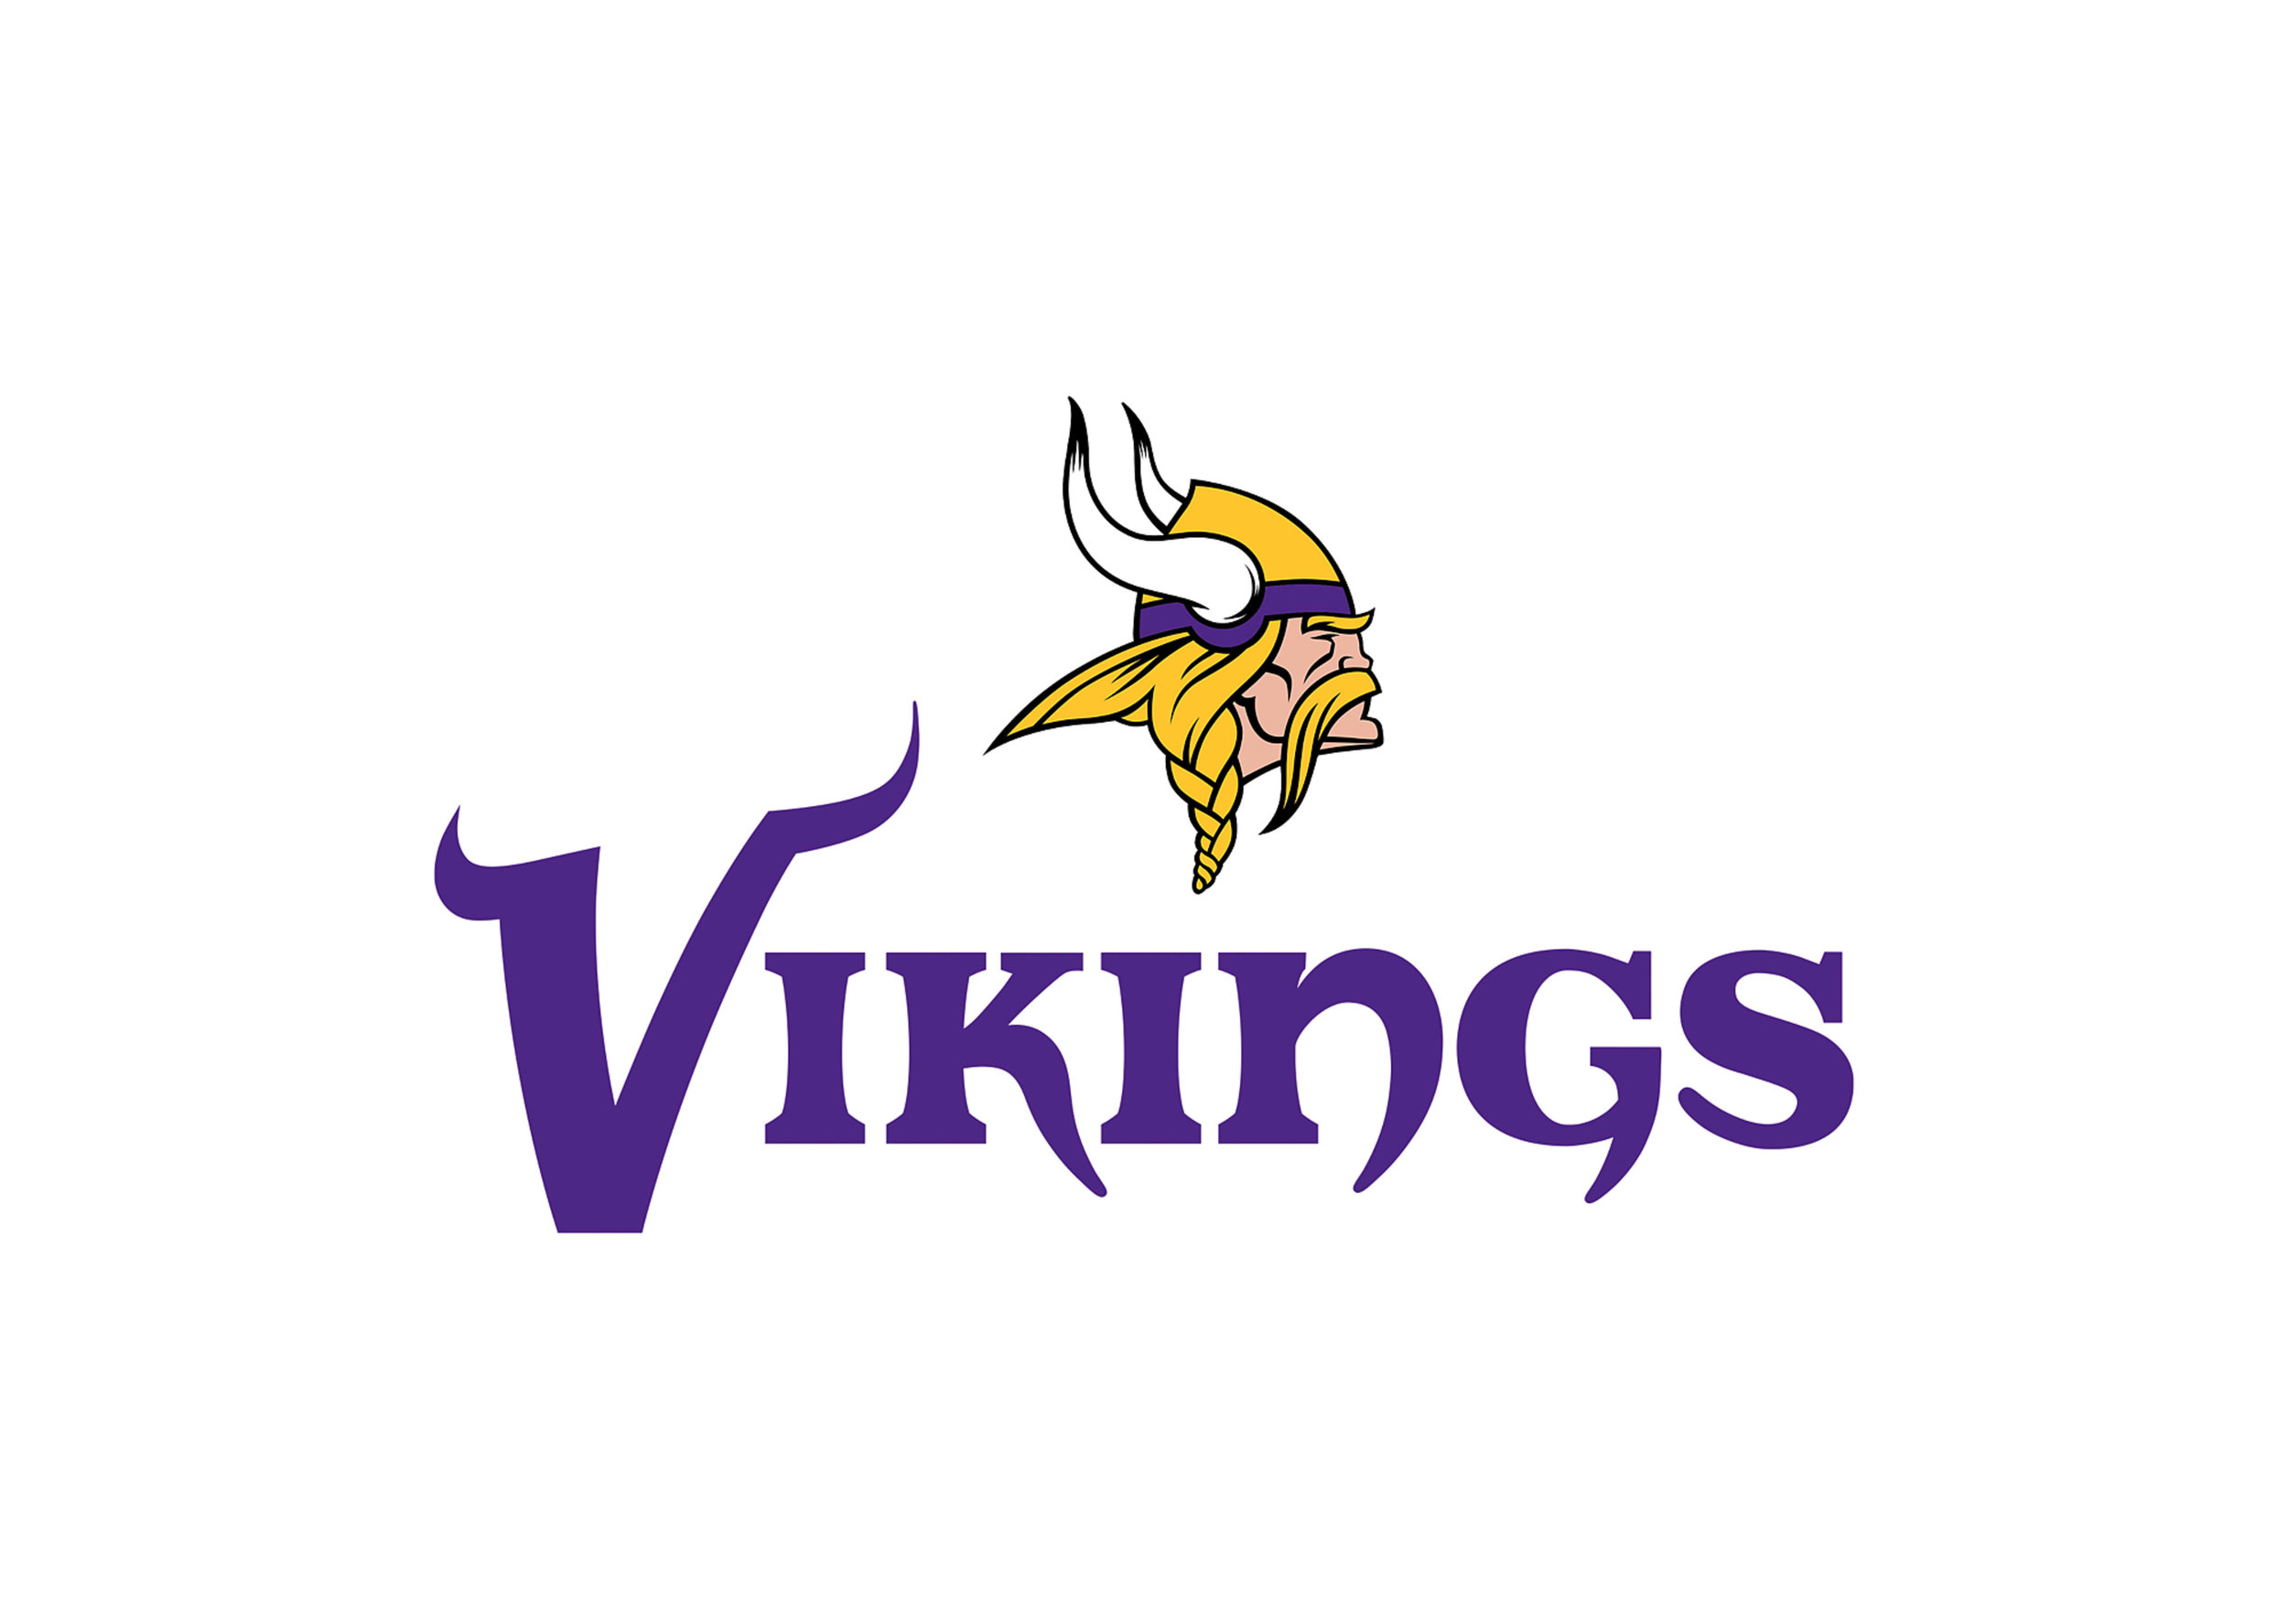 Vikings logo.jpg